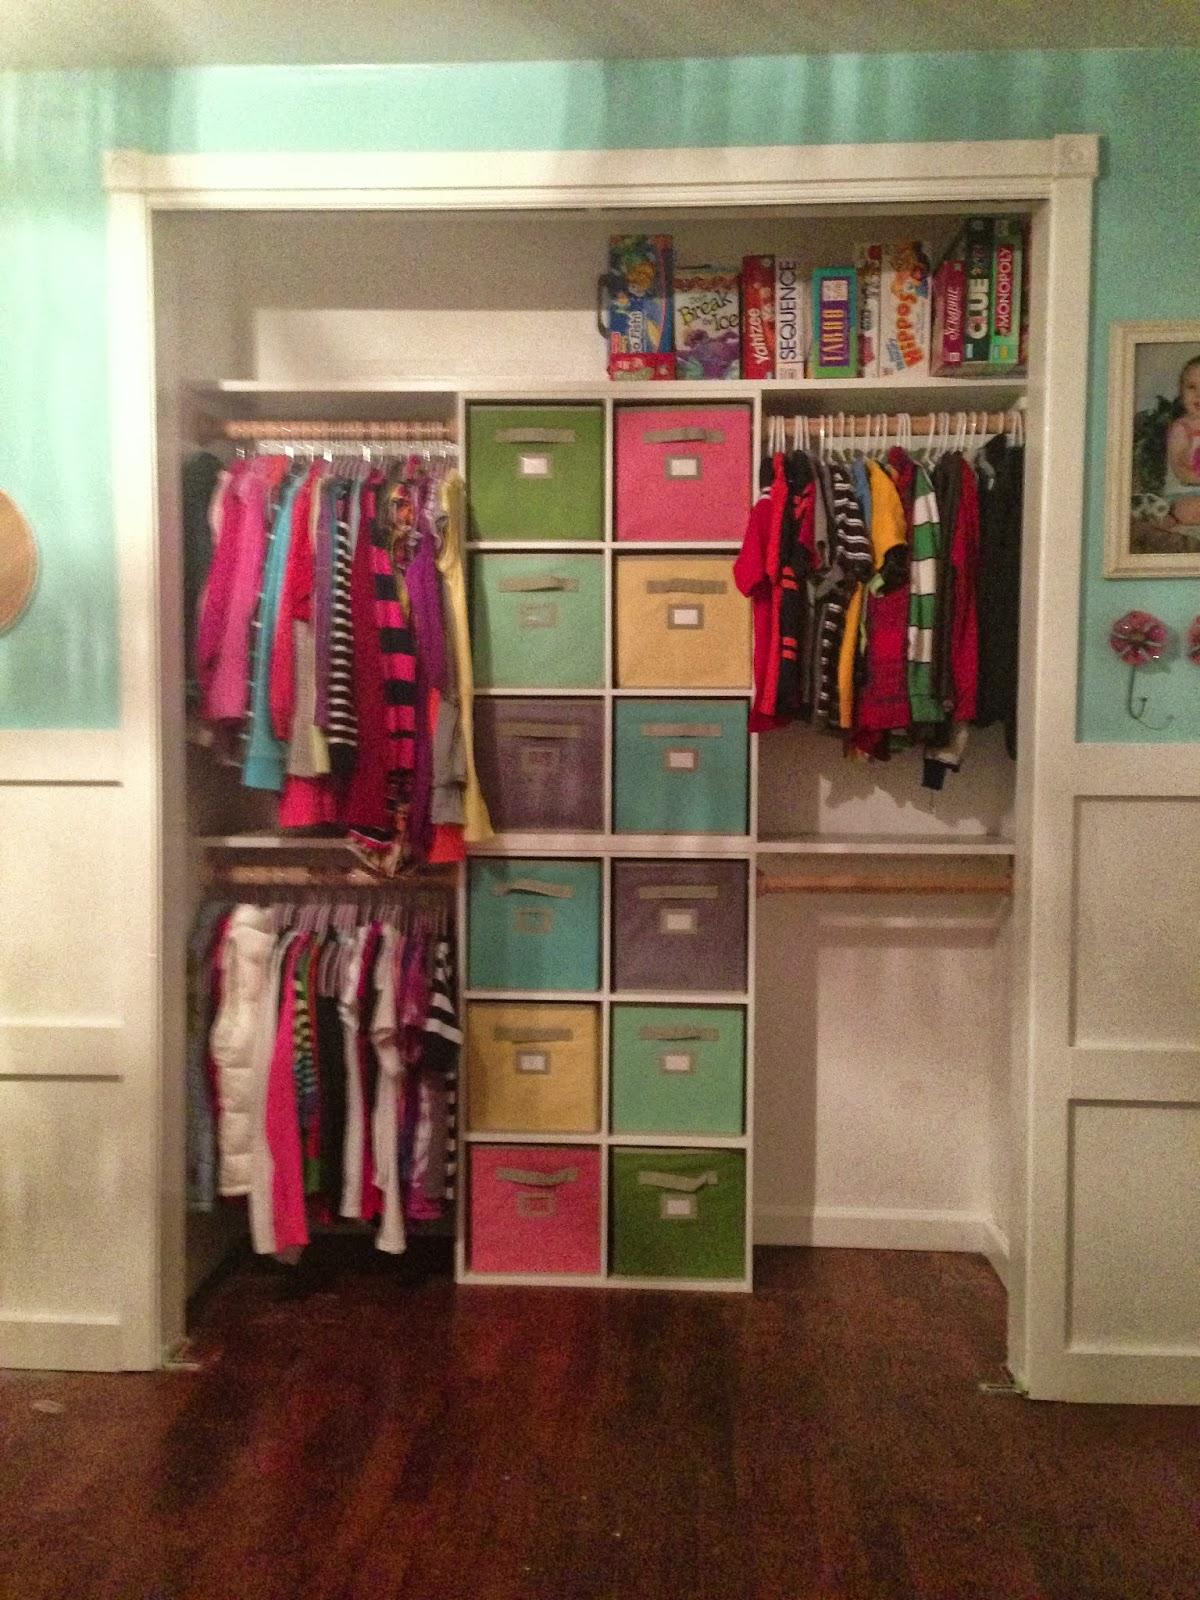 Pics Of Organized Closets: One Thrifty Chick: Quick Fix Closet Organization